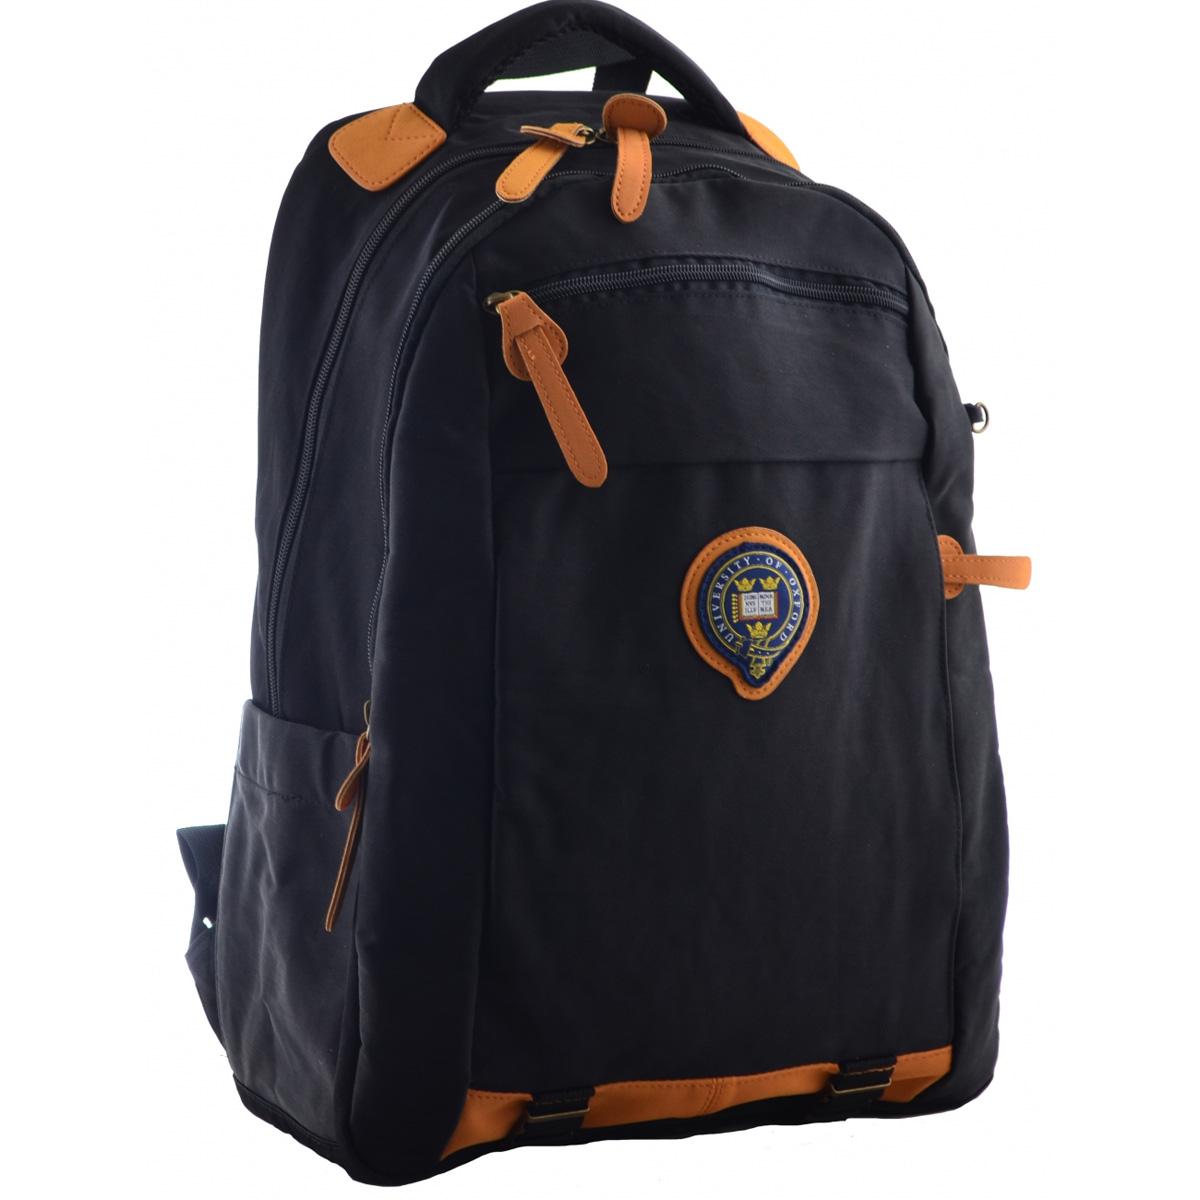 Рюкзак молодежный OX 349, 46*29.5*13, темно-синий